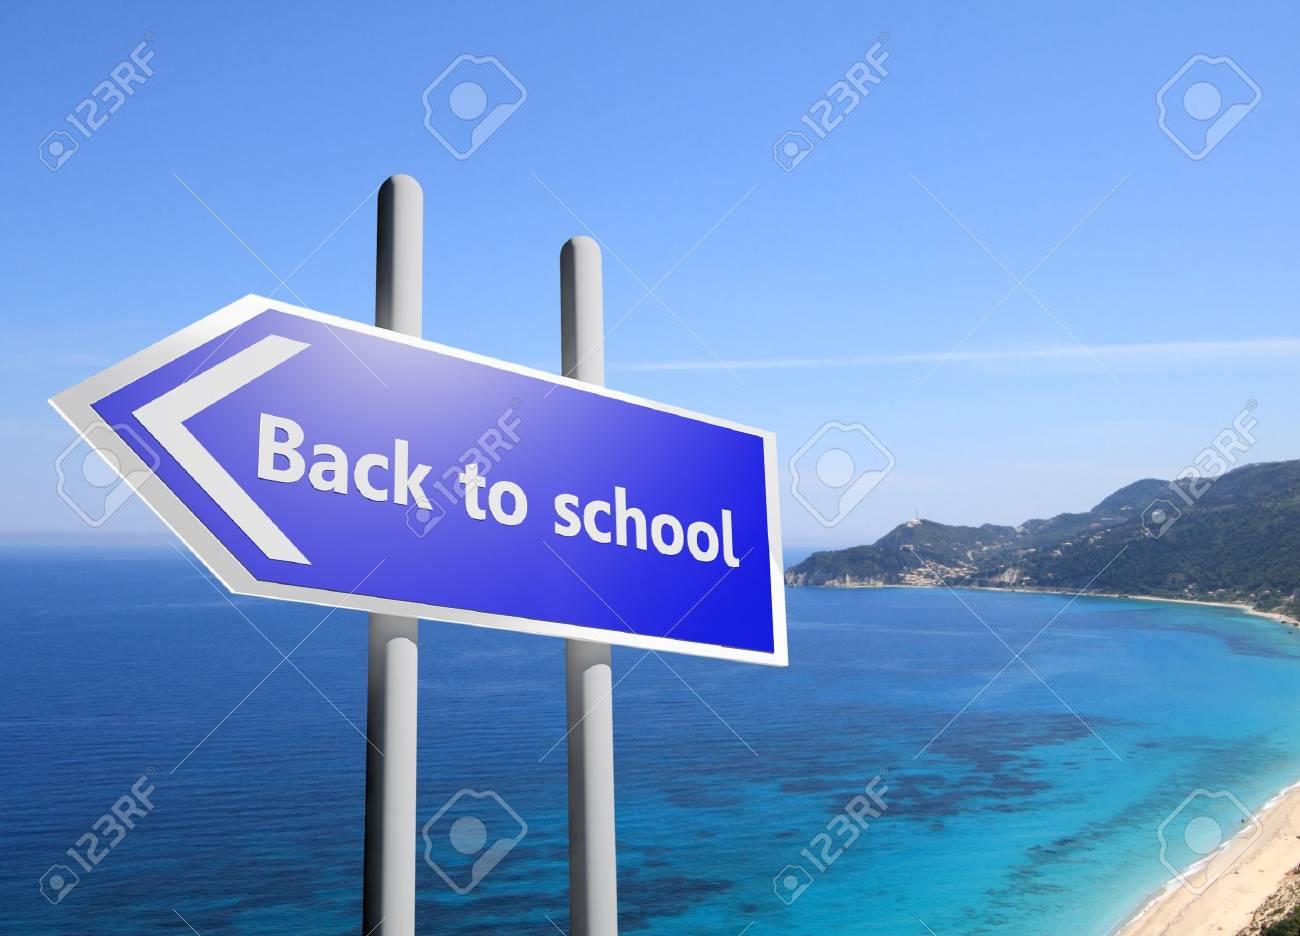 Back to school Stock Photo - 15117020